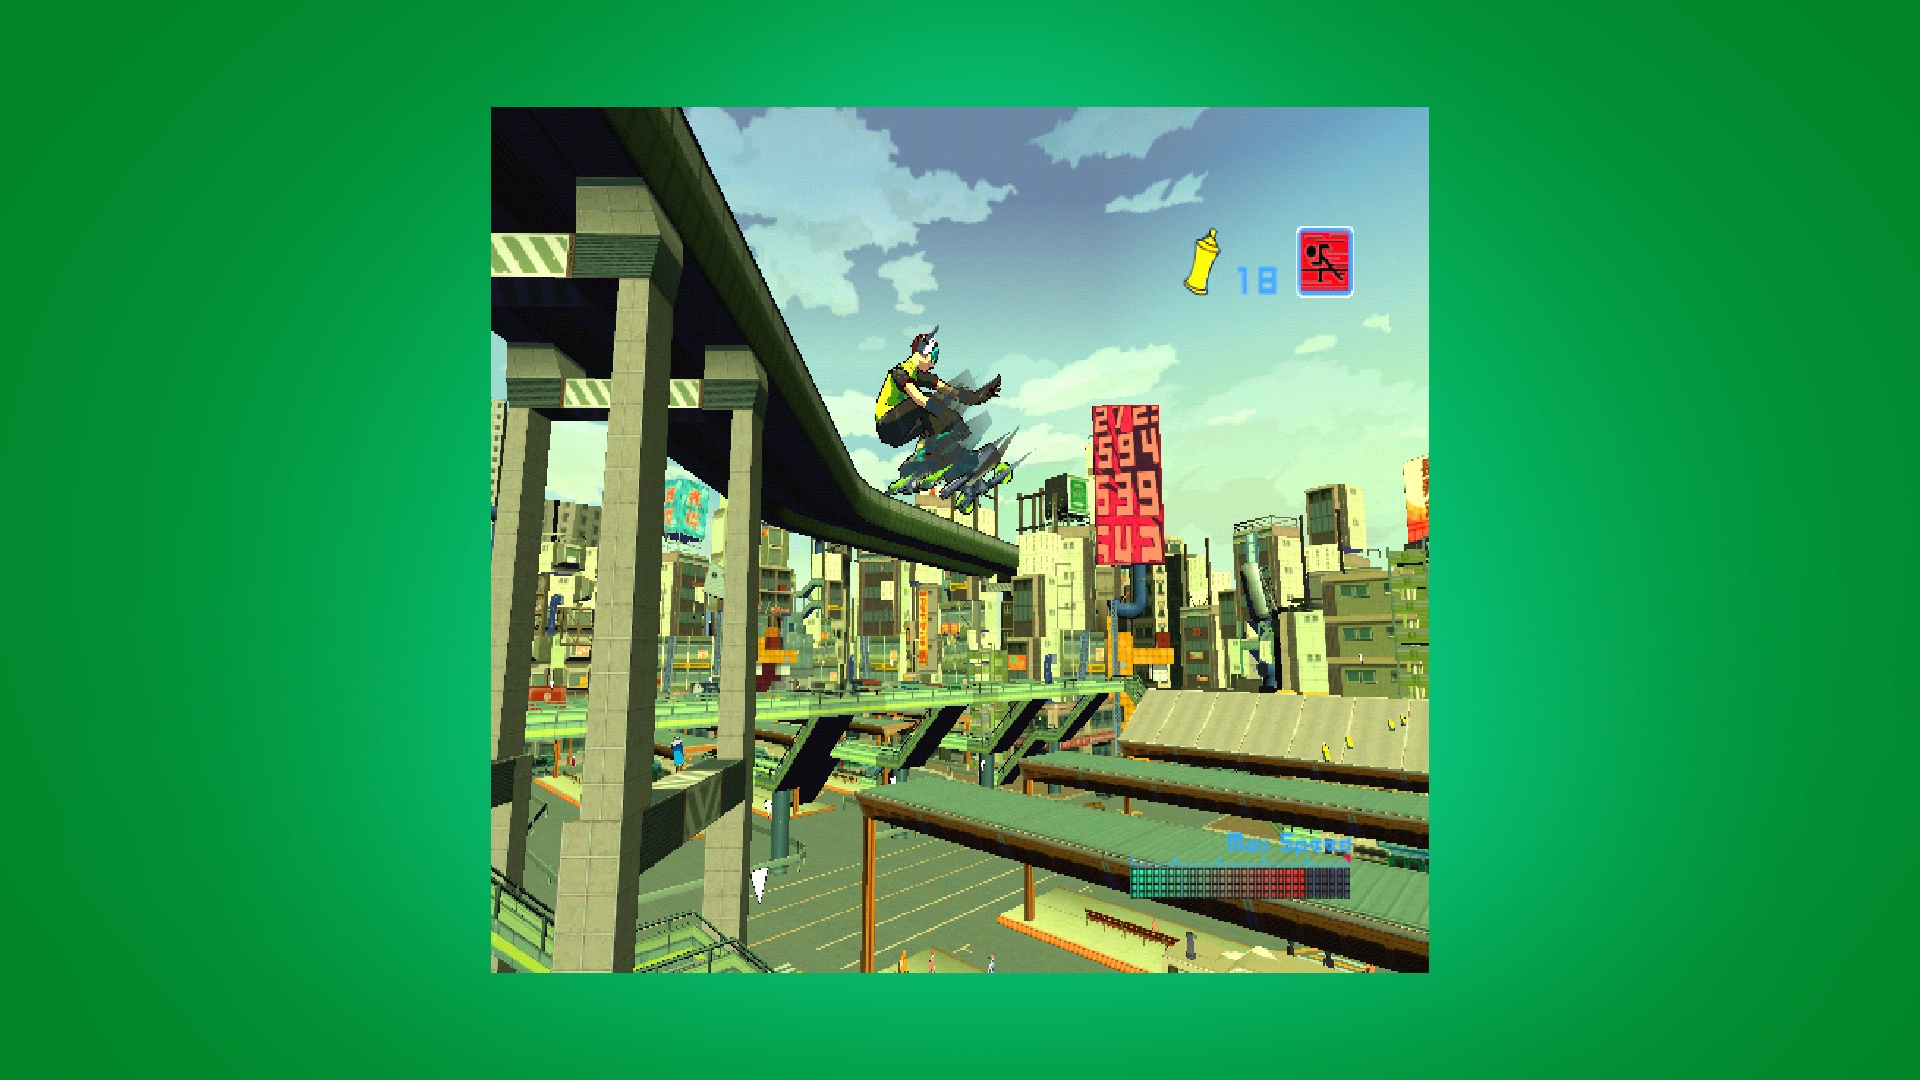 Jet Set Radio Future gameplay